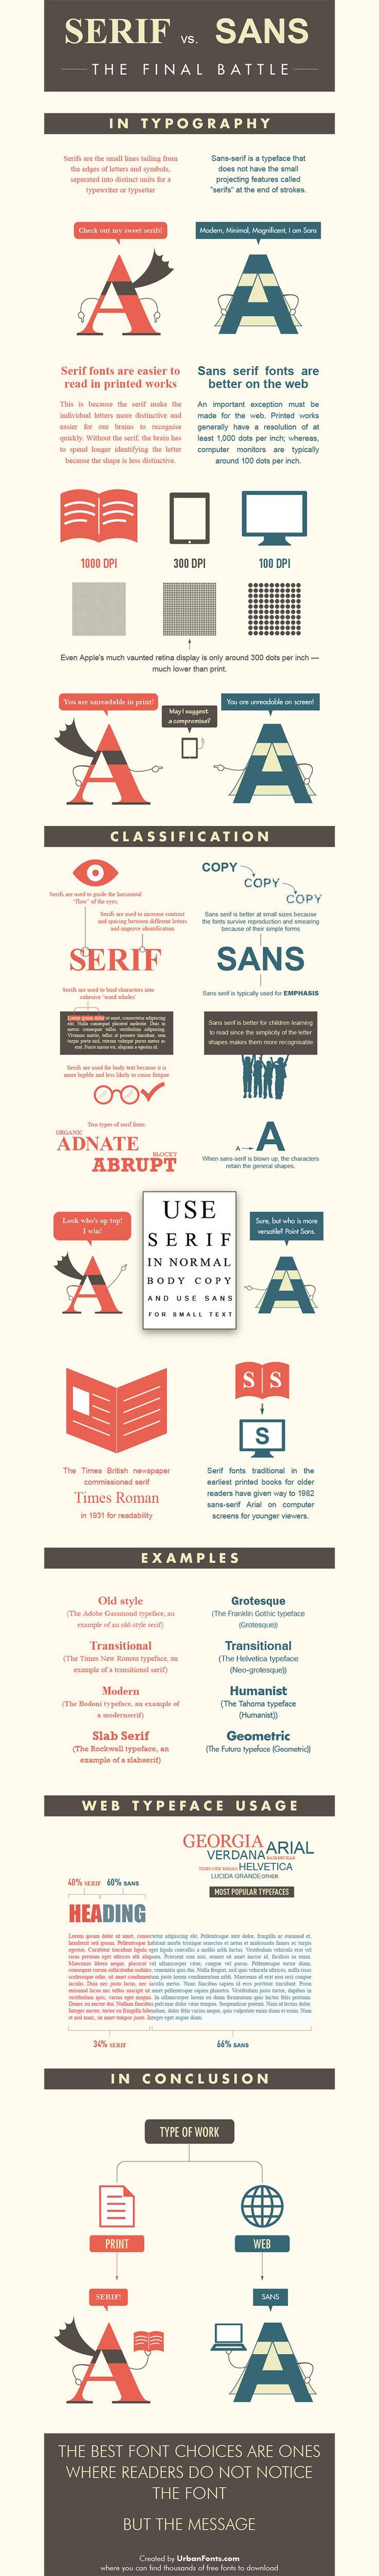 serif-vs-sans-serif.jpg (782×5323)http://www.creativebloq.com/graphic-design-tips/information-graphics-1232836